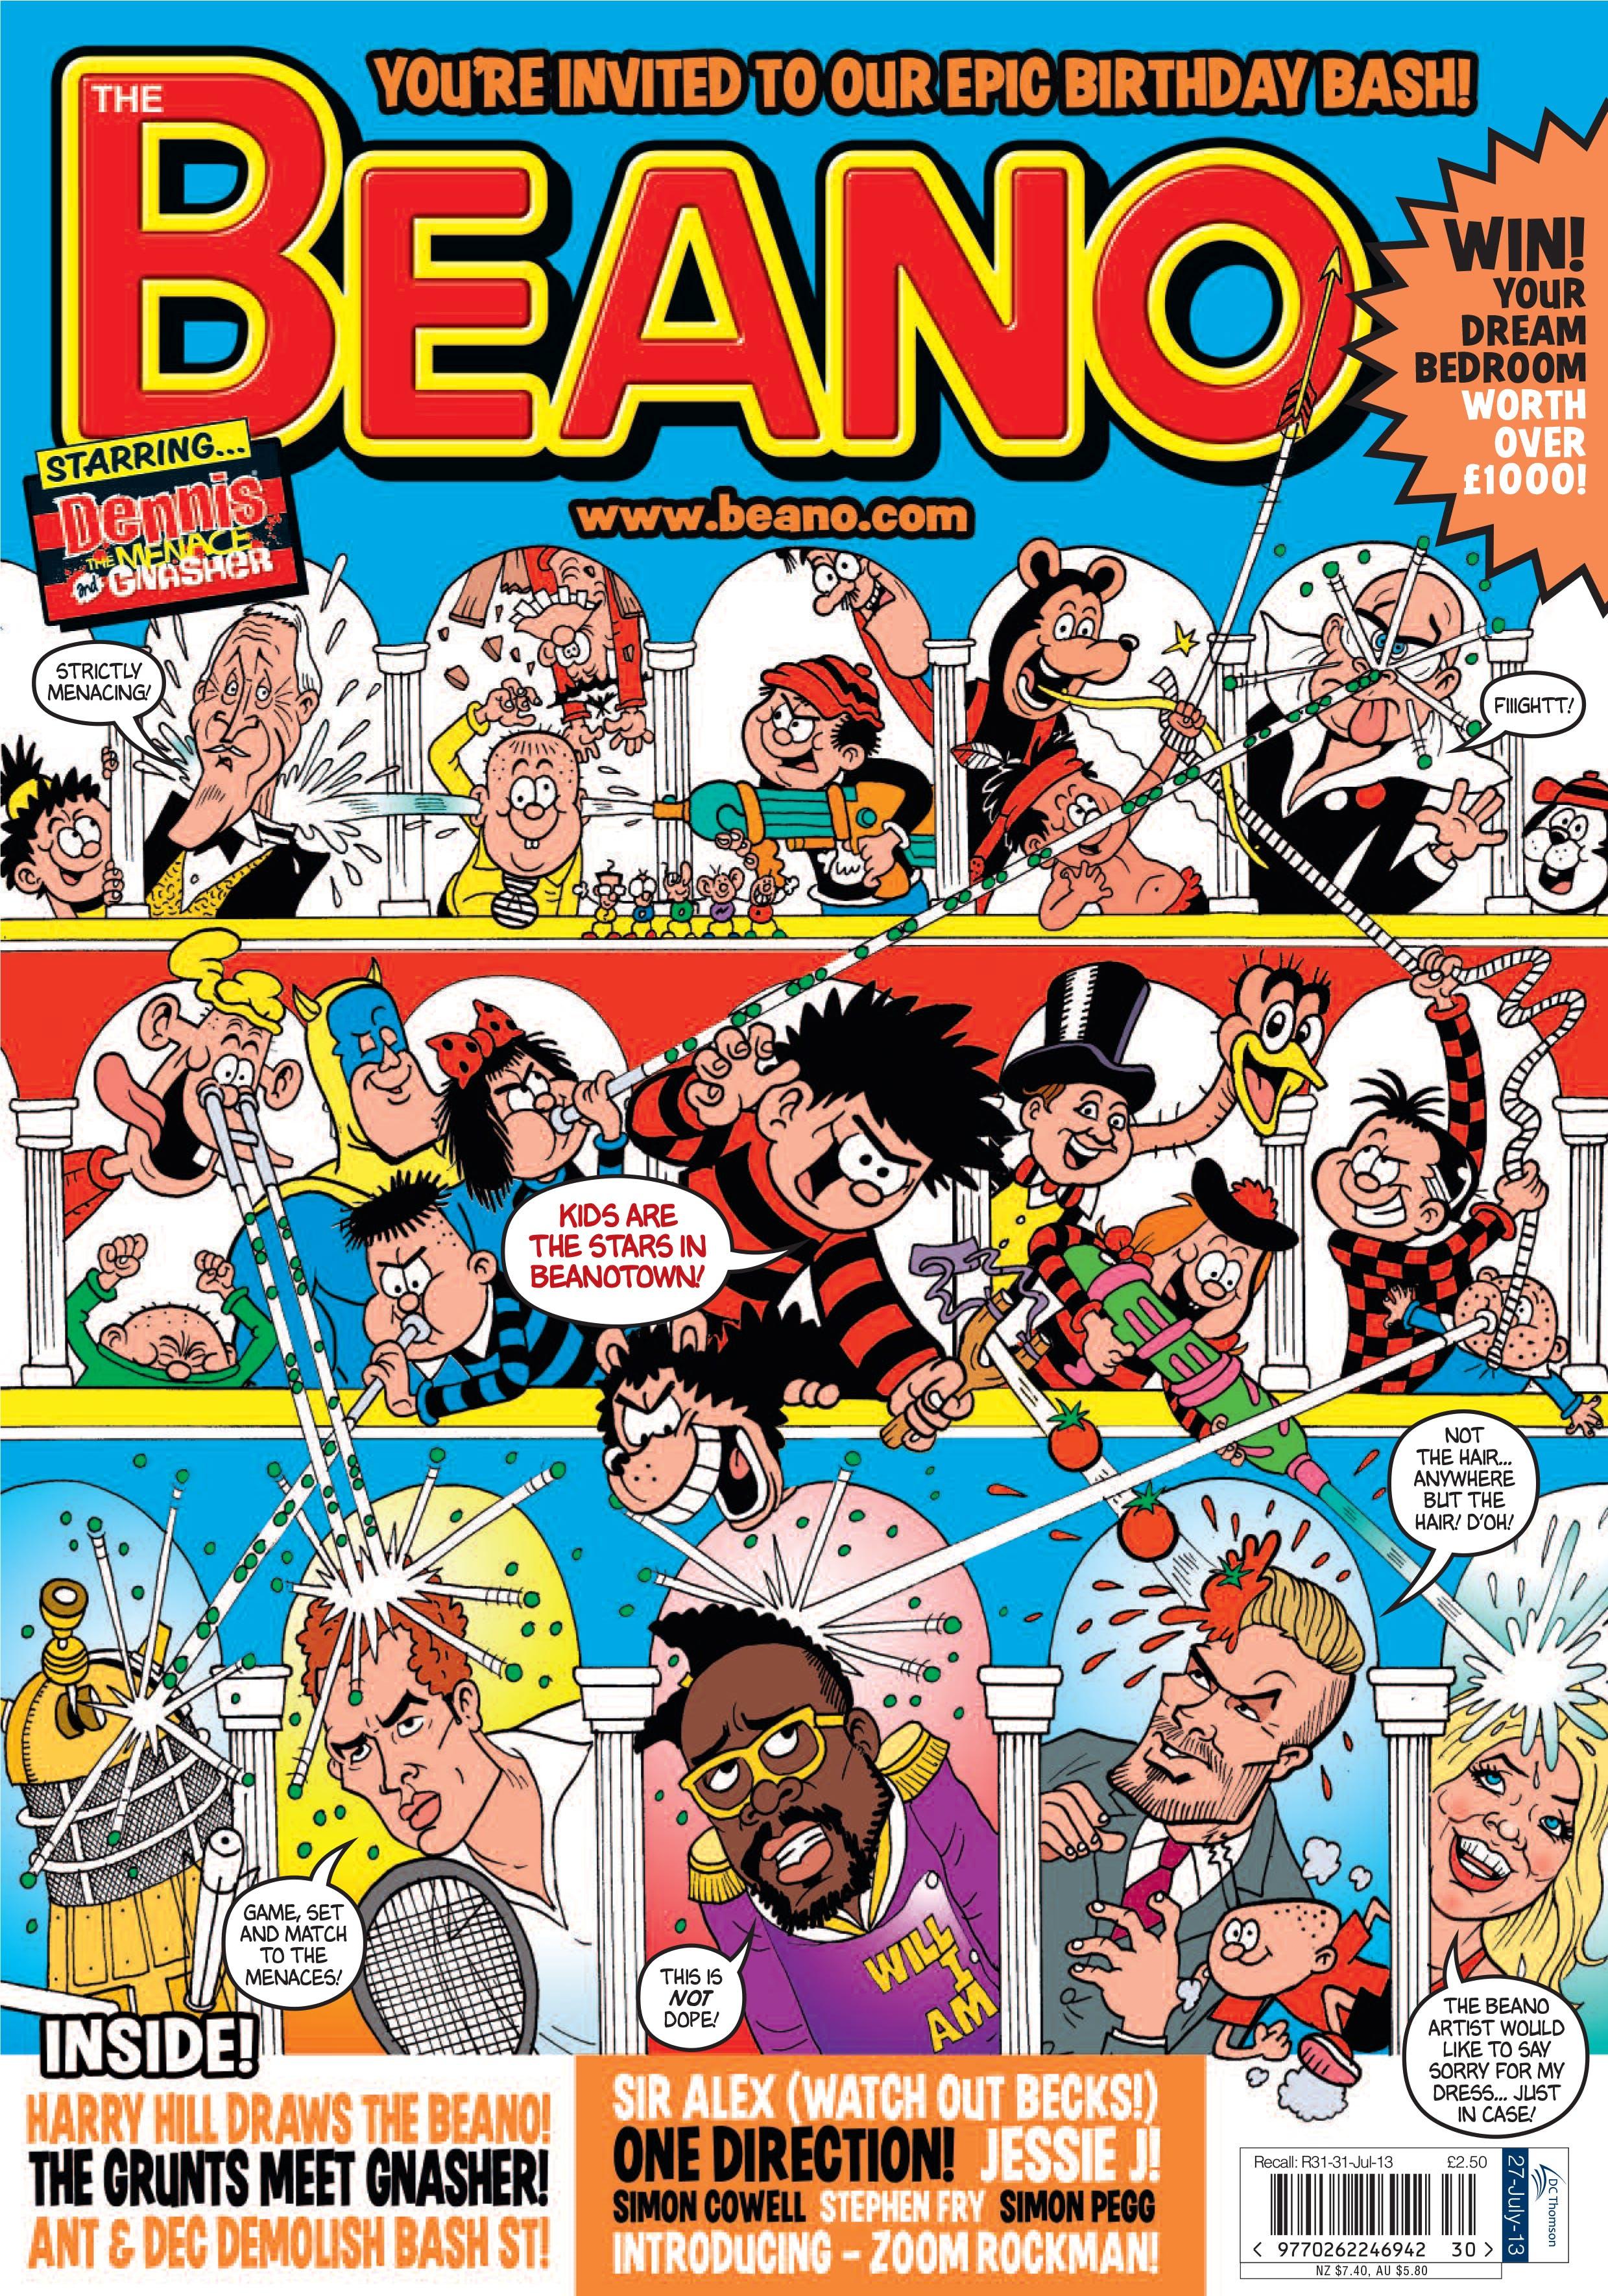 2013 beano cover